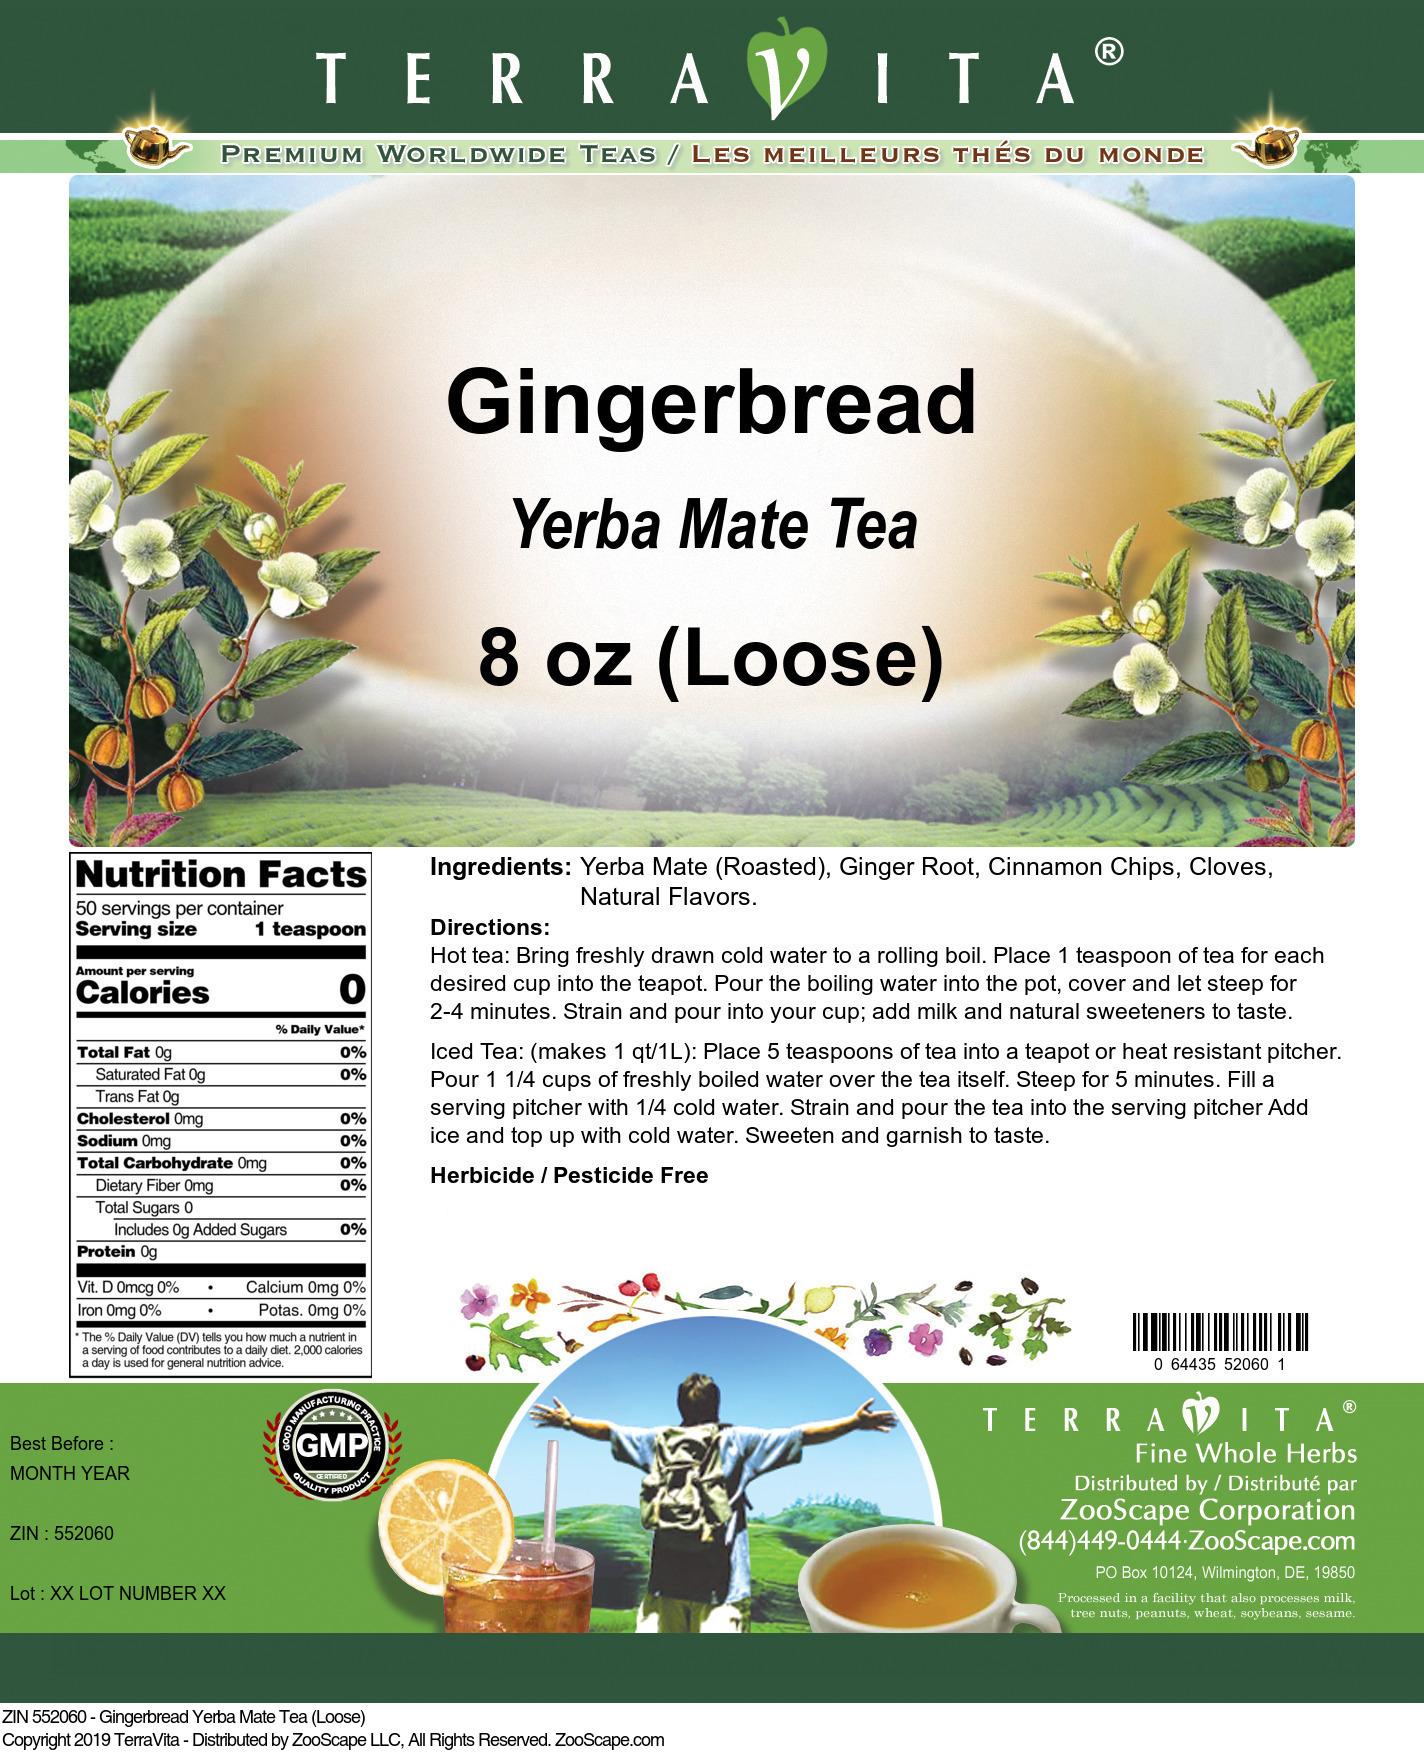 Gingerbread Yerba Mate